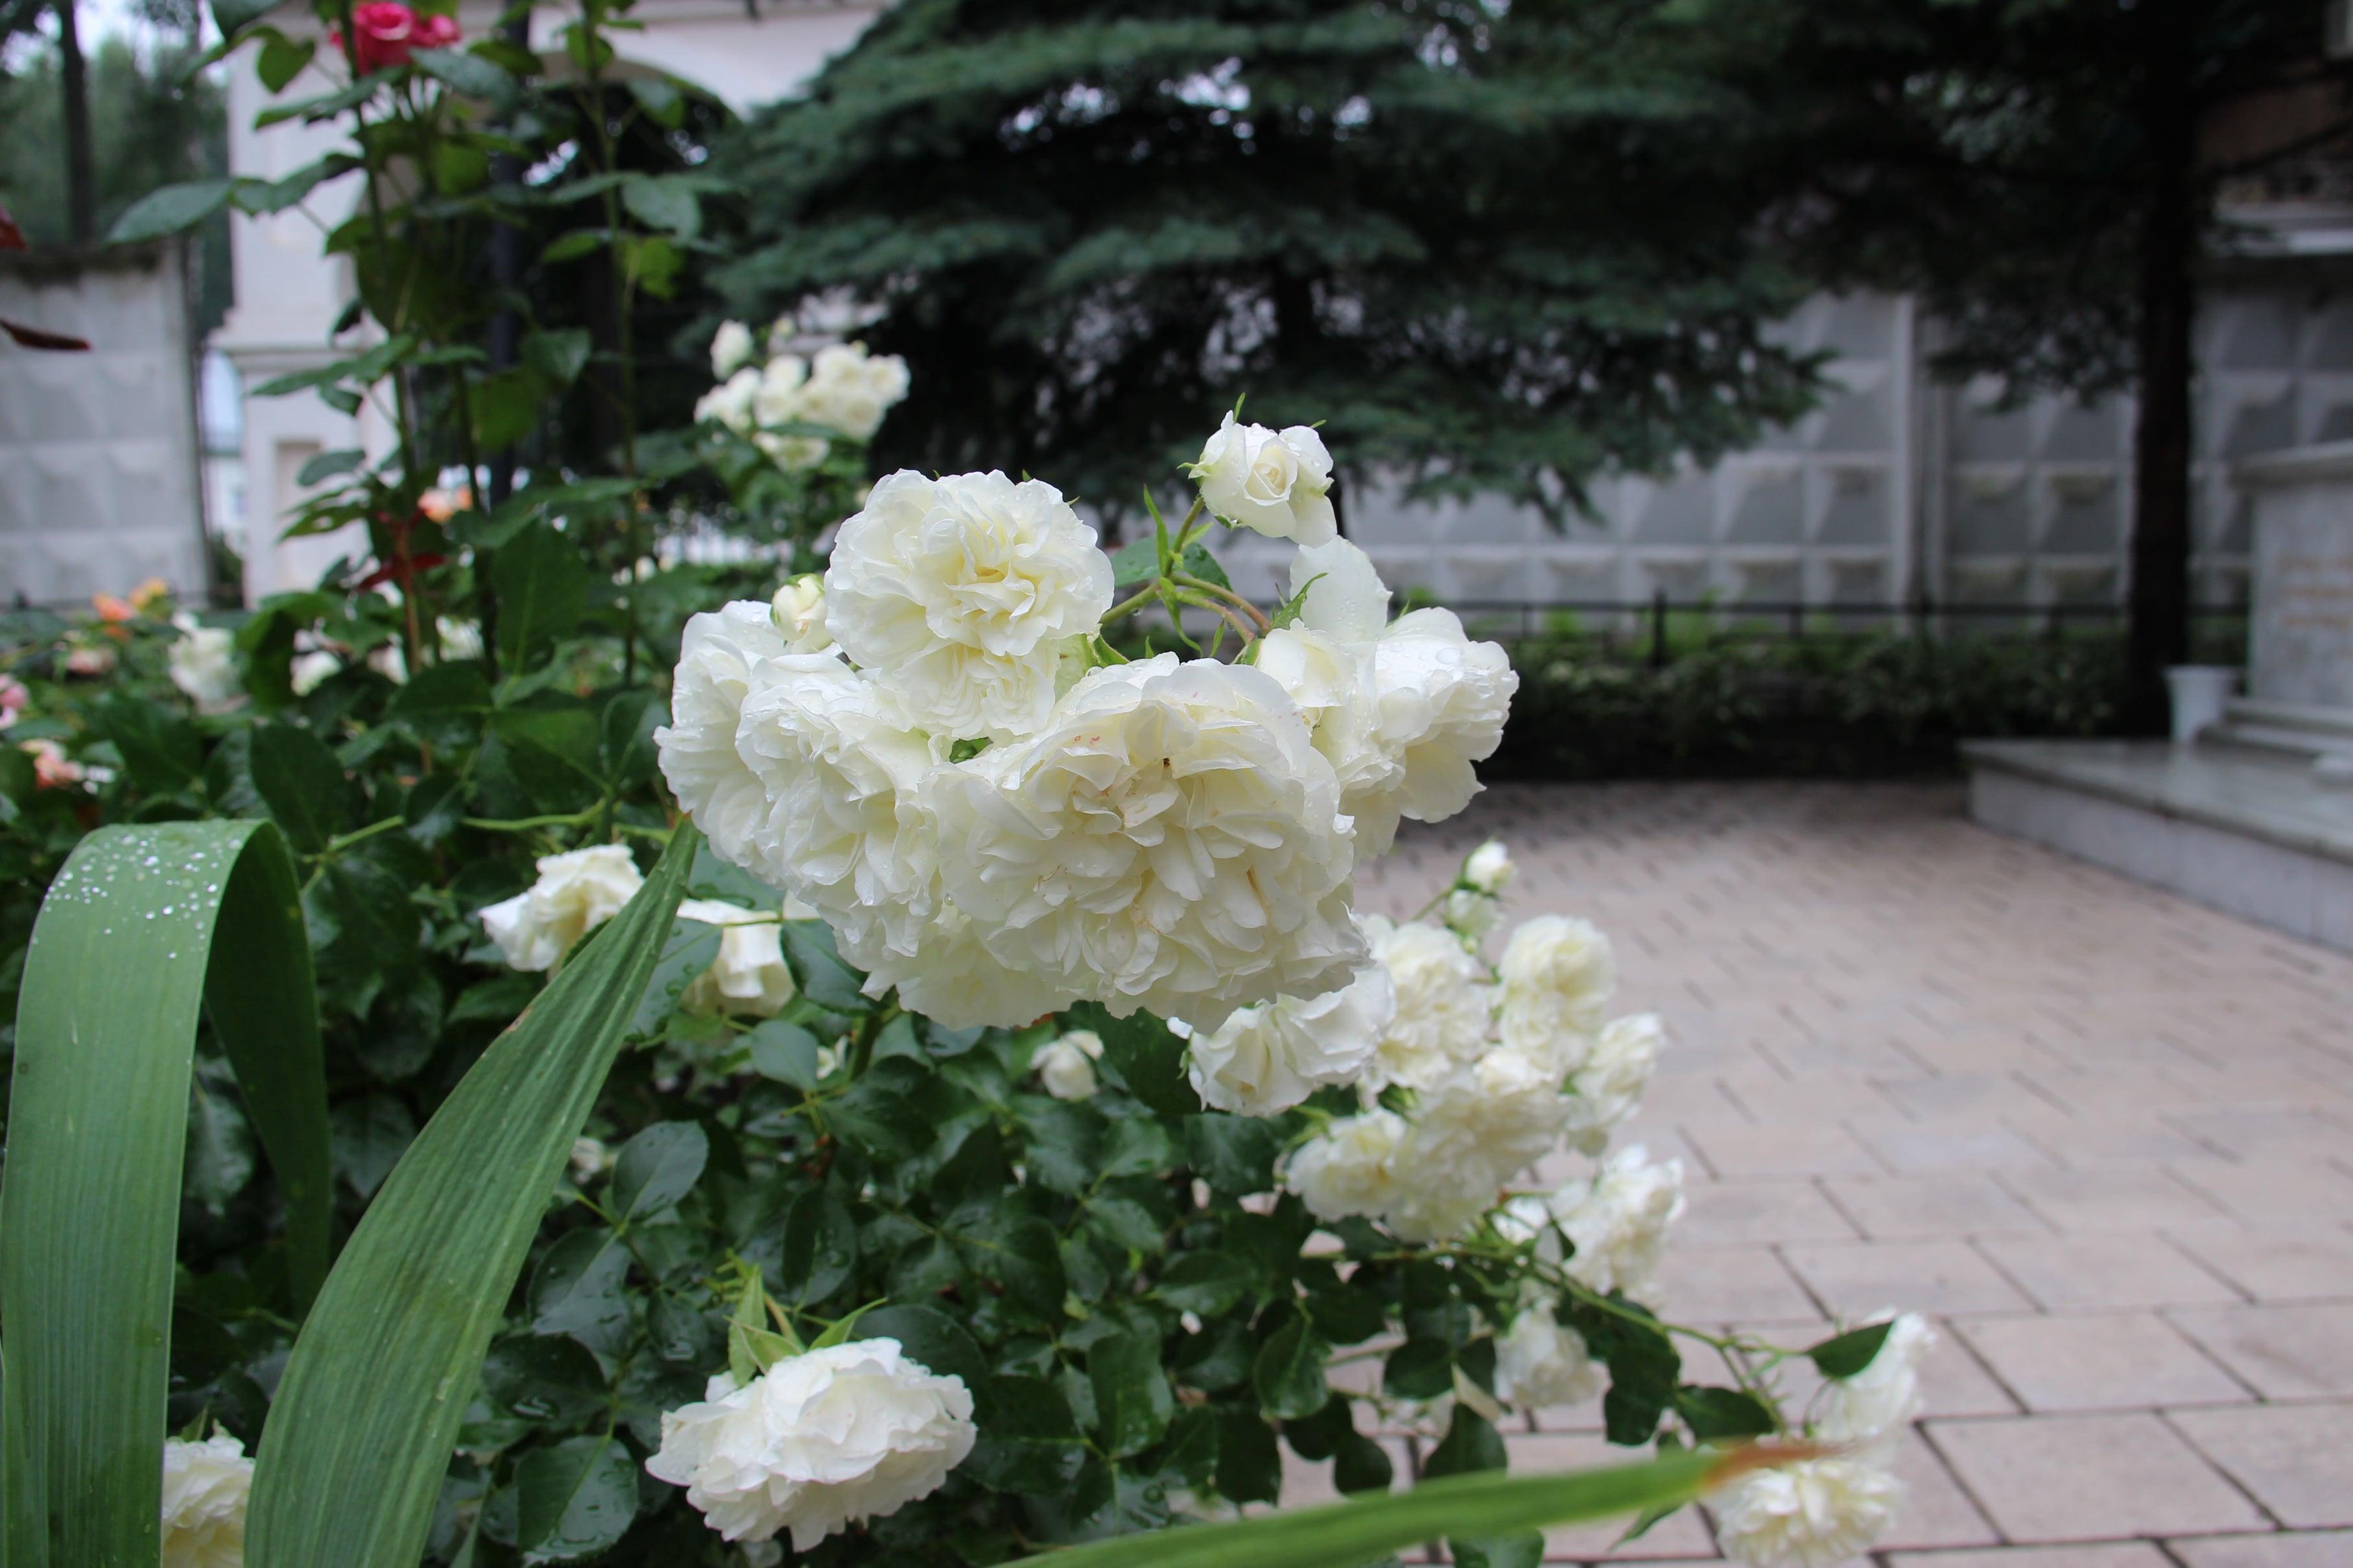 http://monuspen.ru/photoreports/63e9f01a87b40309900def101d755fi5.JPG